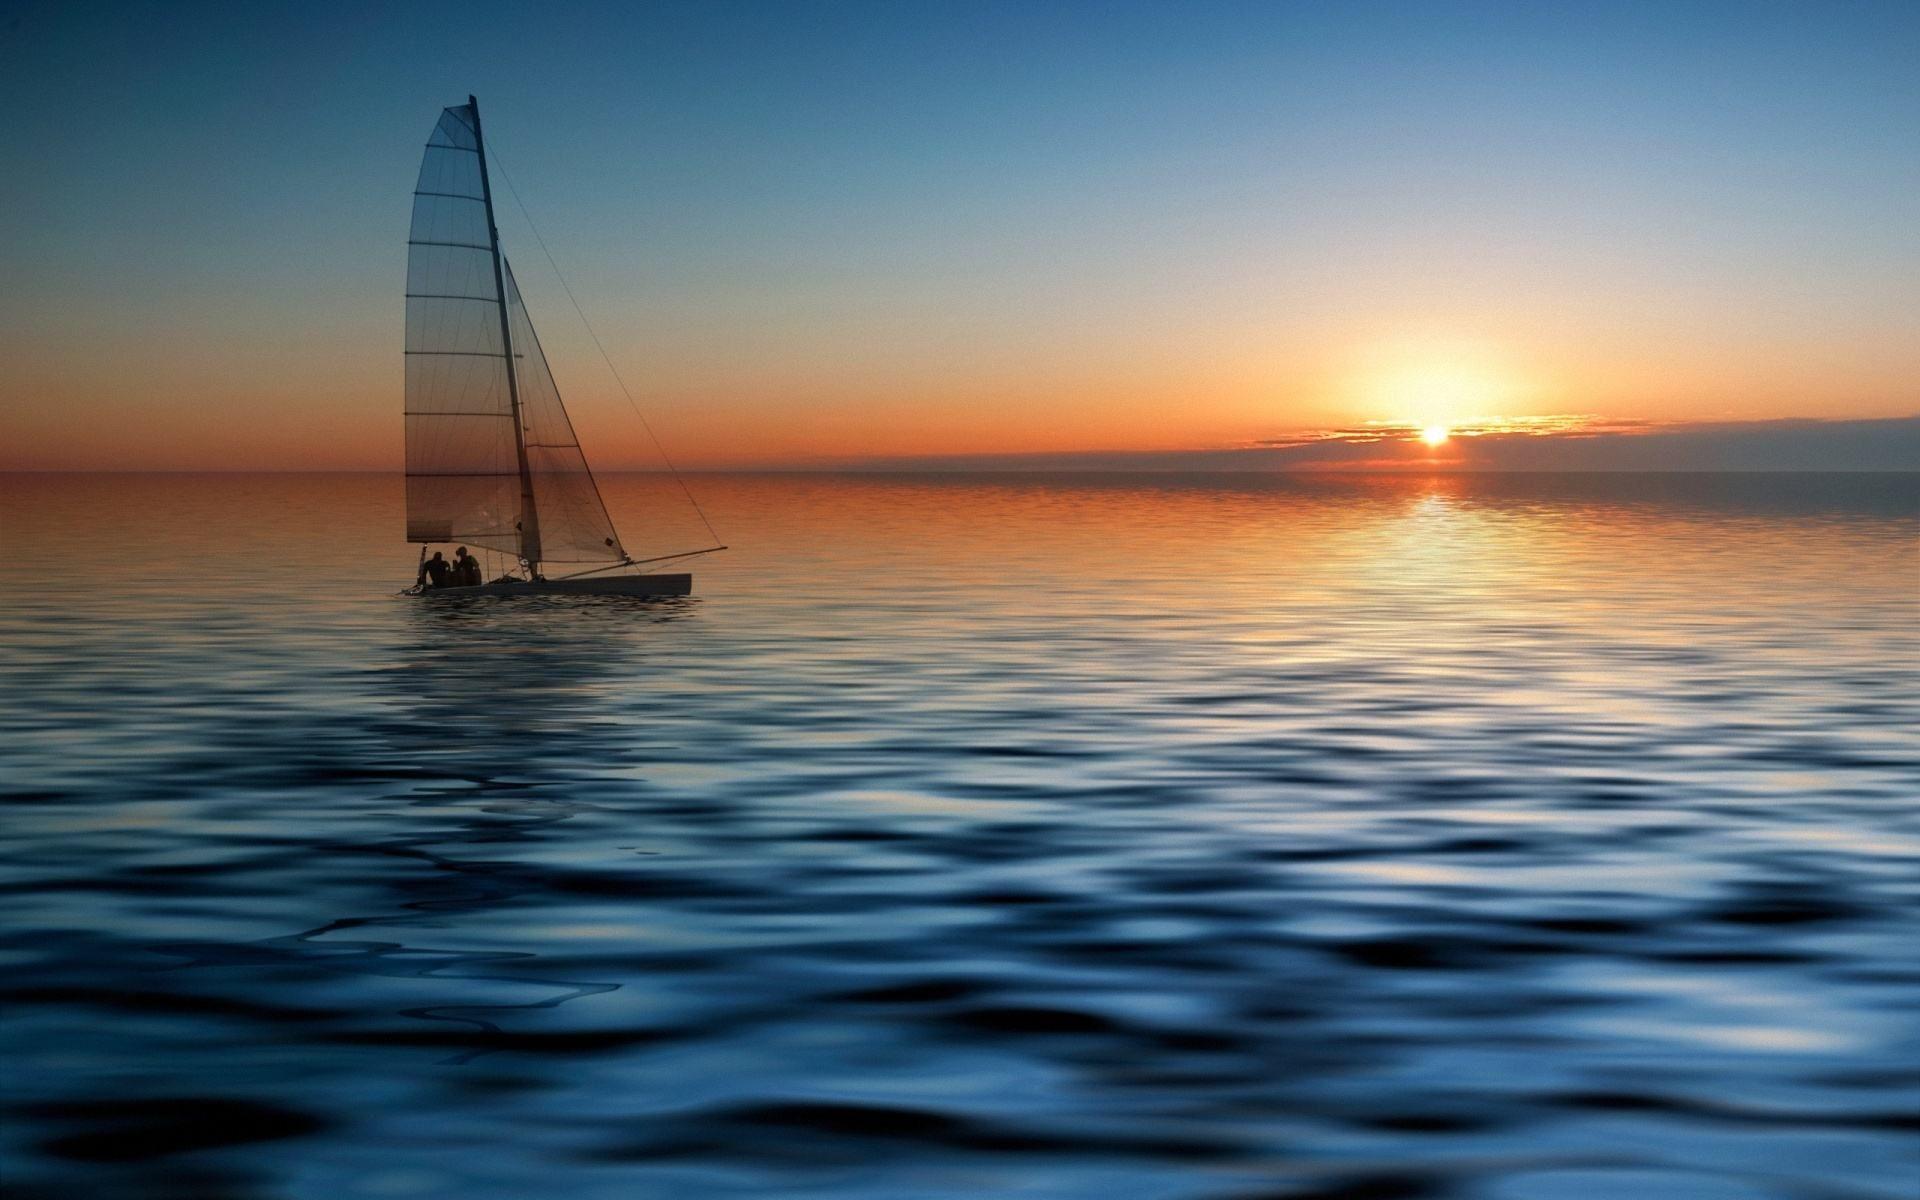 Обои яхта, Пейзаж. Природа foto 13